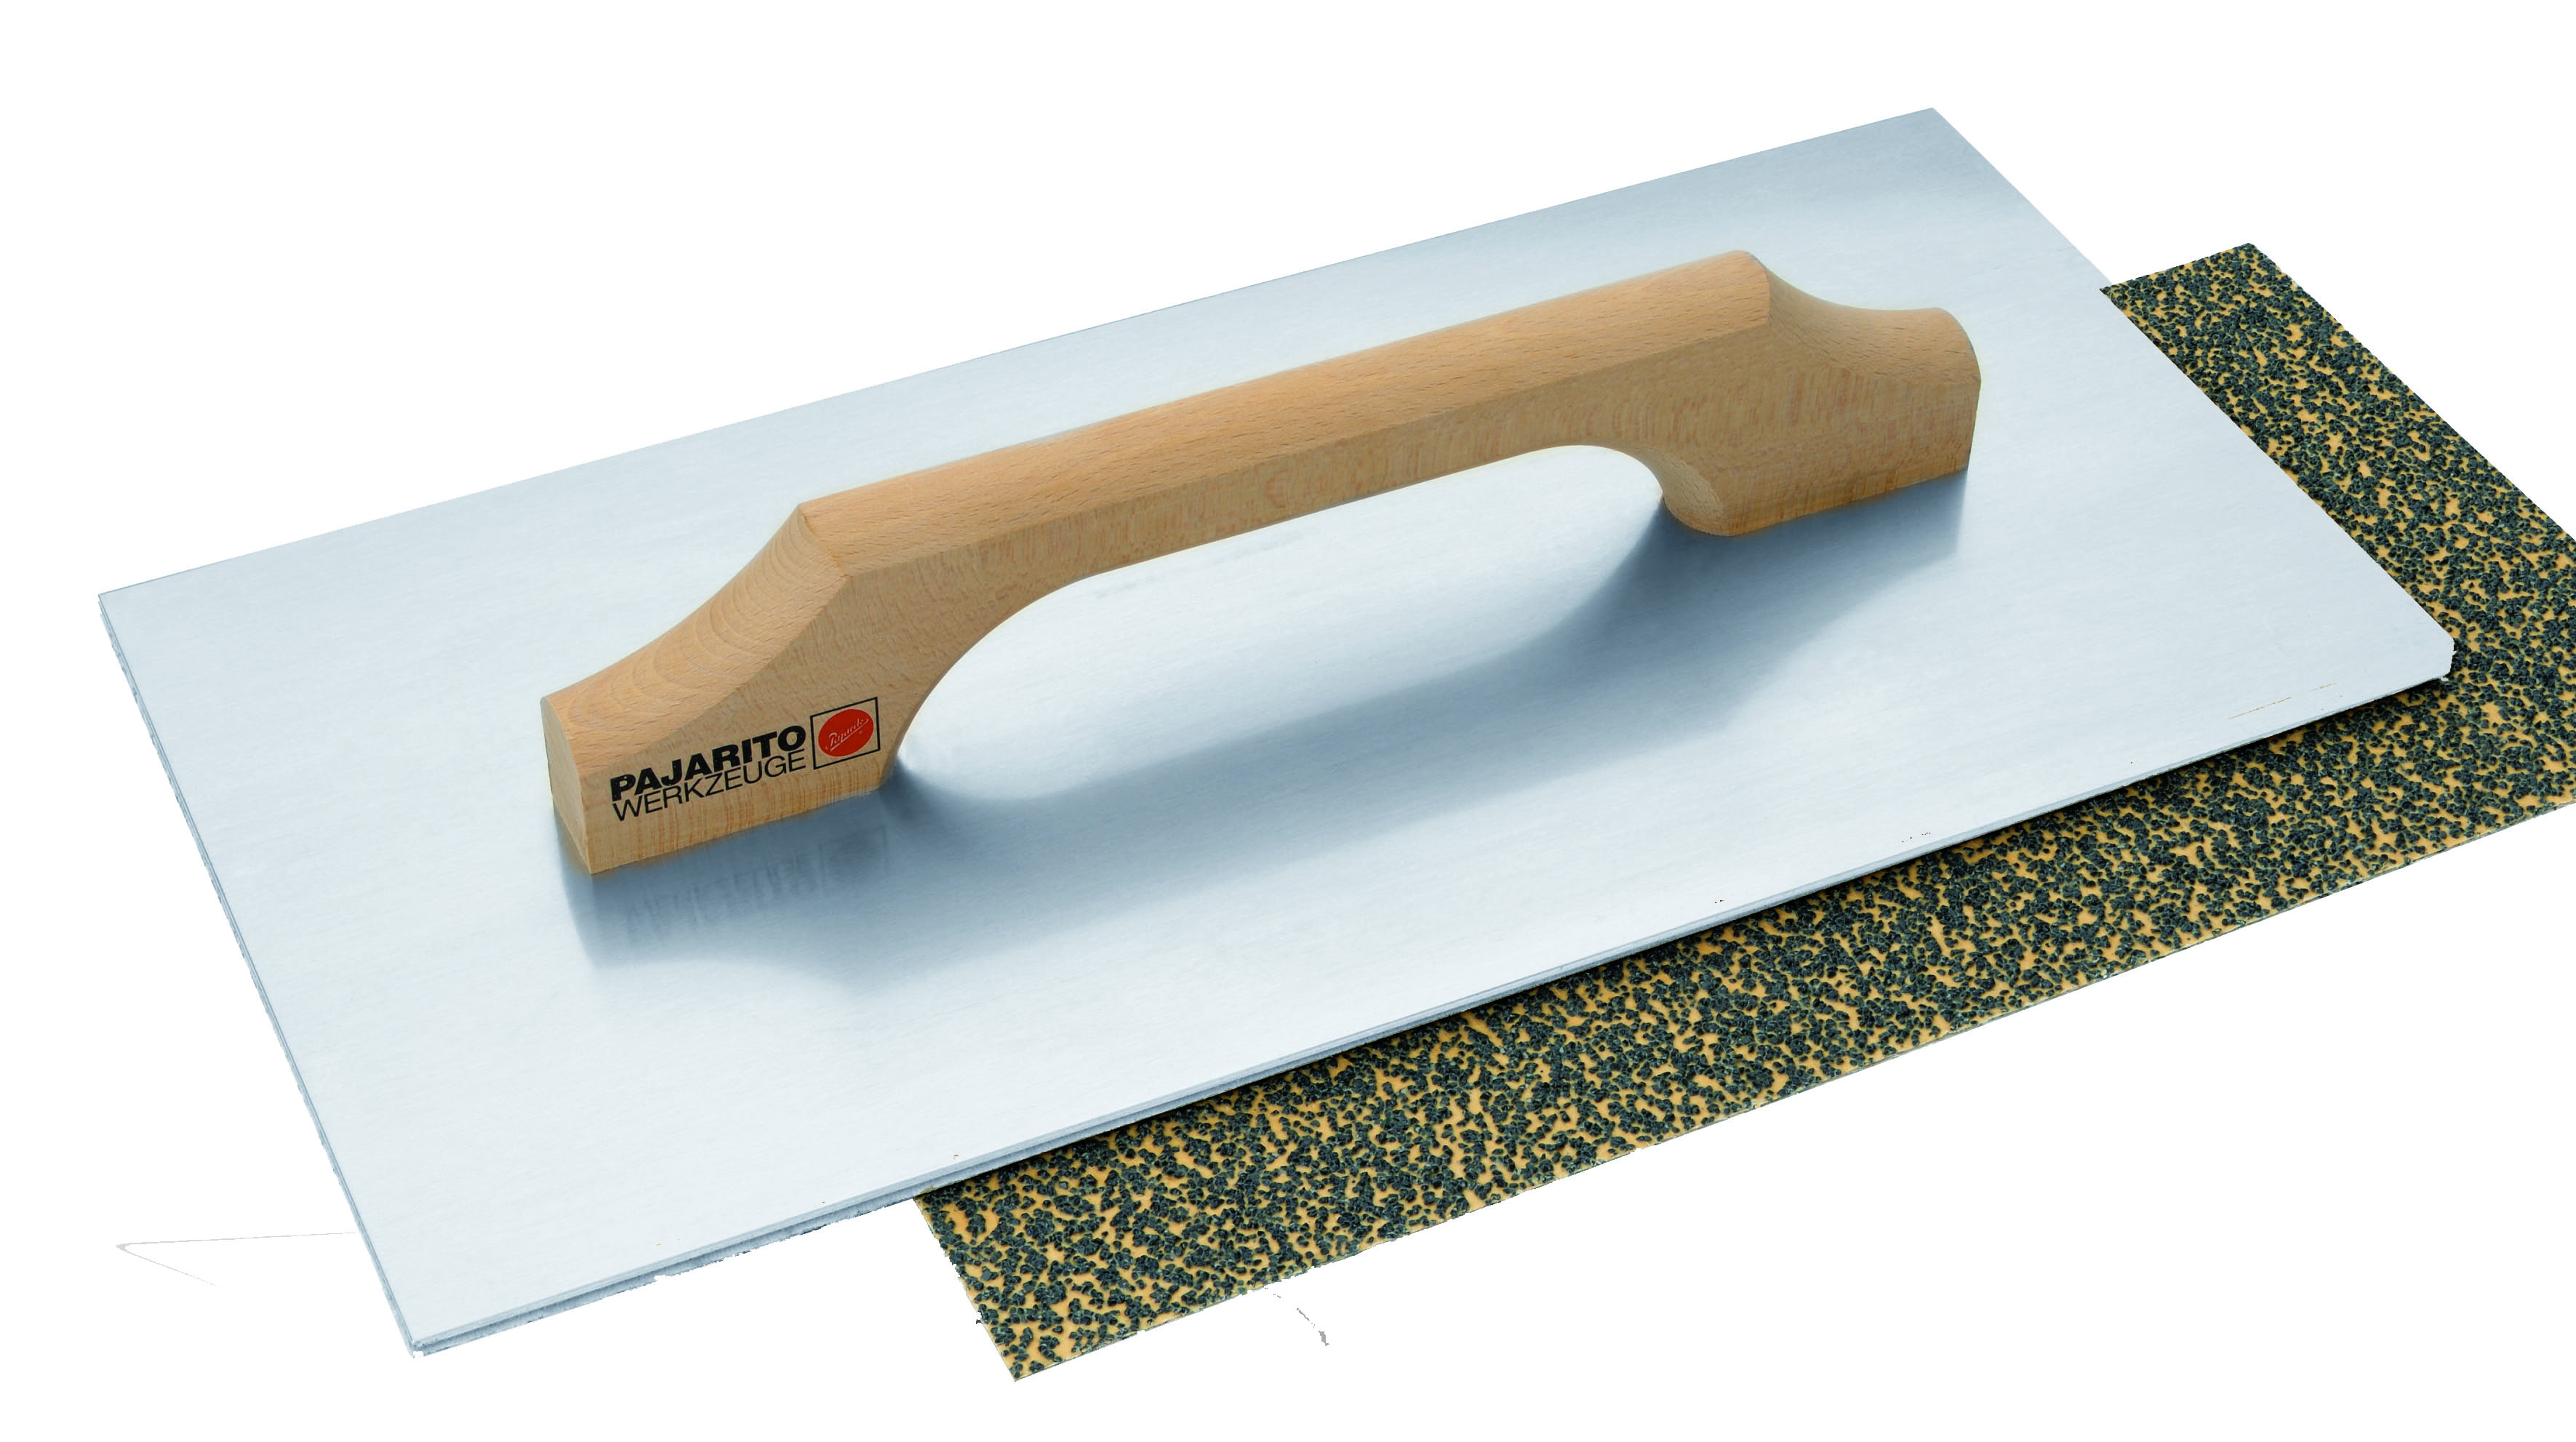 Corundum-coated paper Pajarito